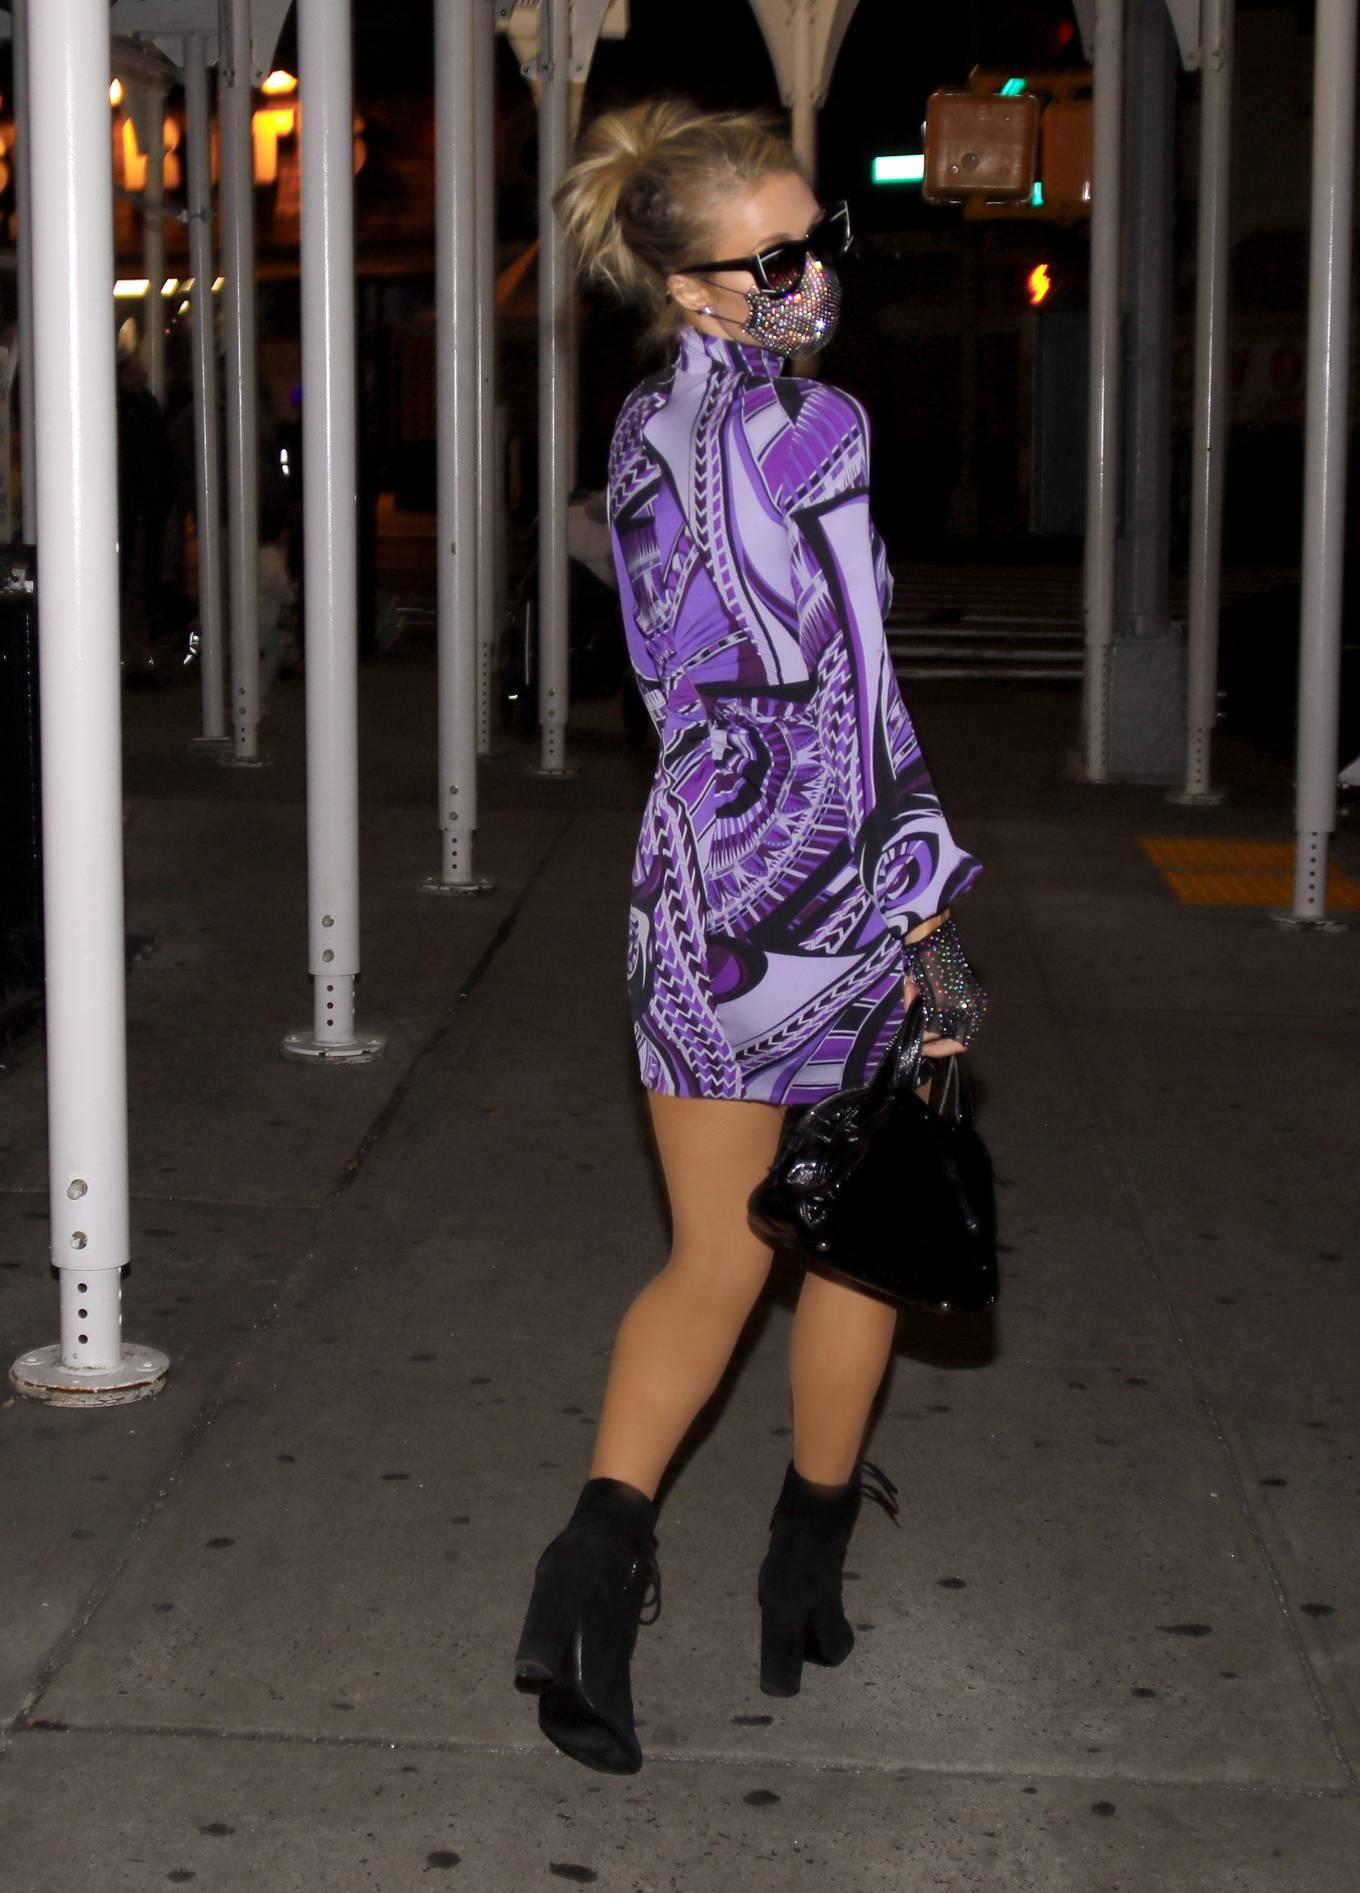 Paris Hilton 2020 : Paris Hilton – In tight dress nightout in NYC-08